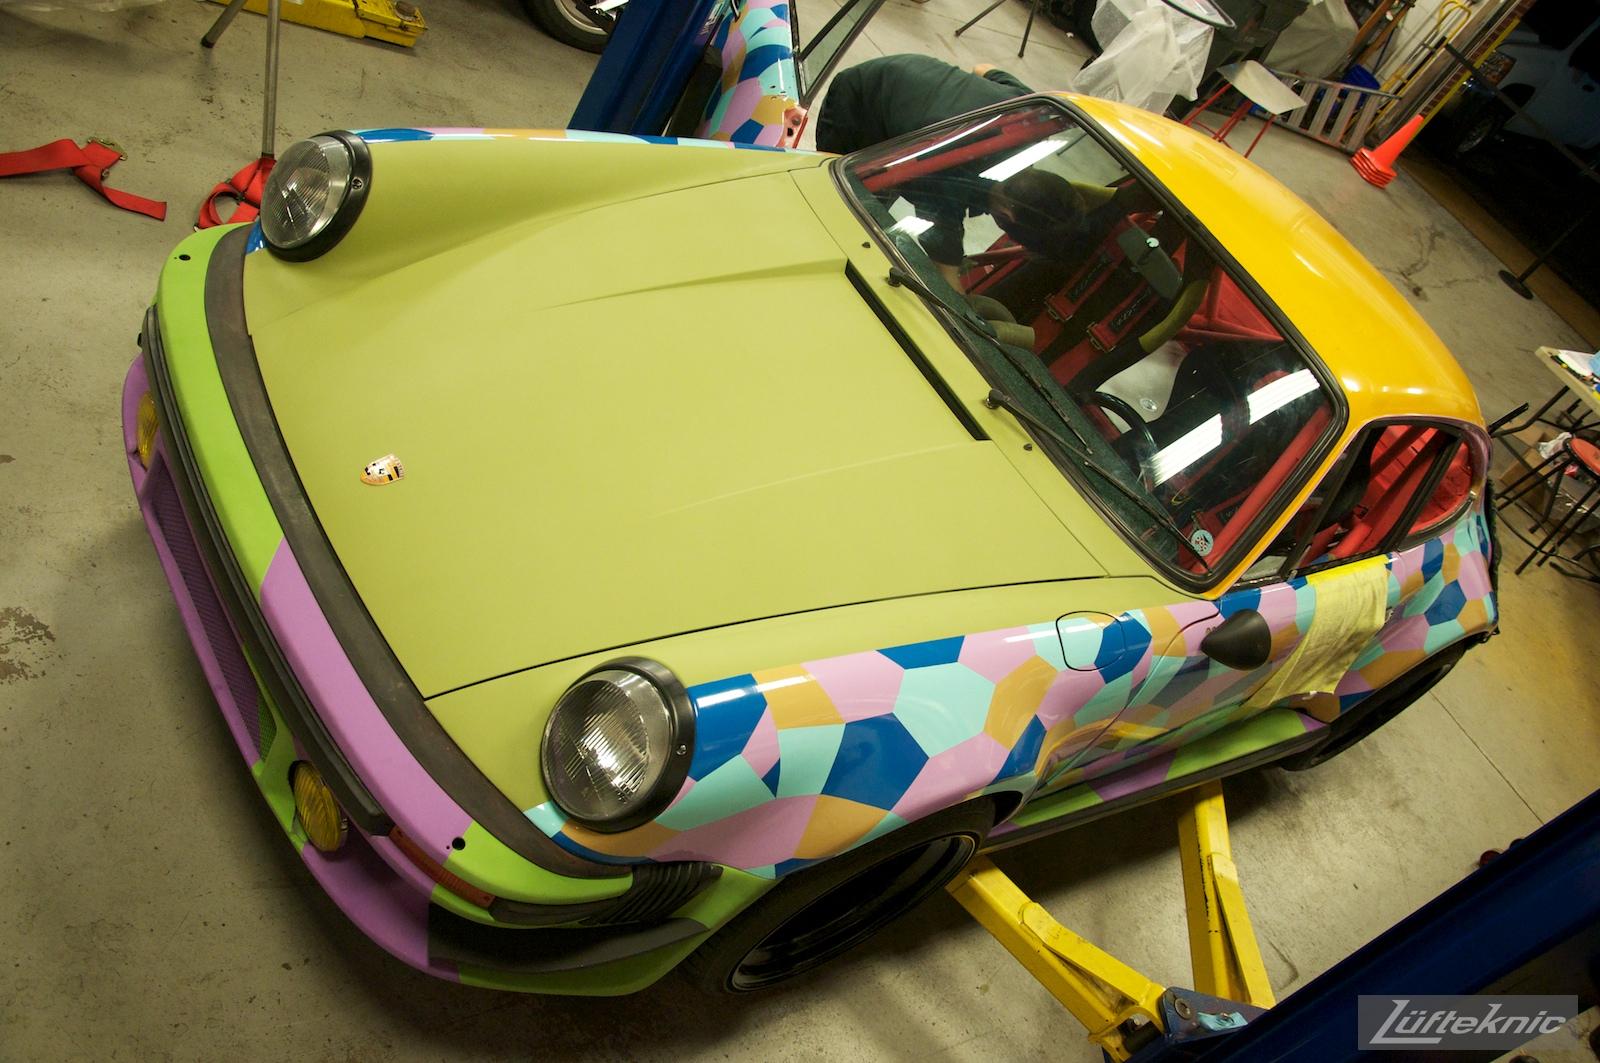 A first glimpse of a complete Lüfteknic #projectstuka Porsche 930 Turbo